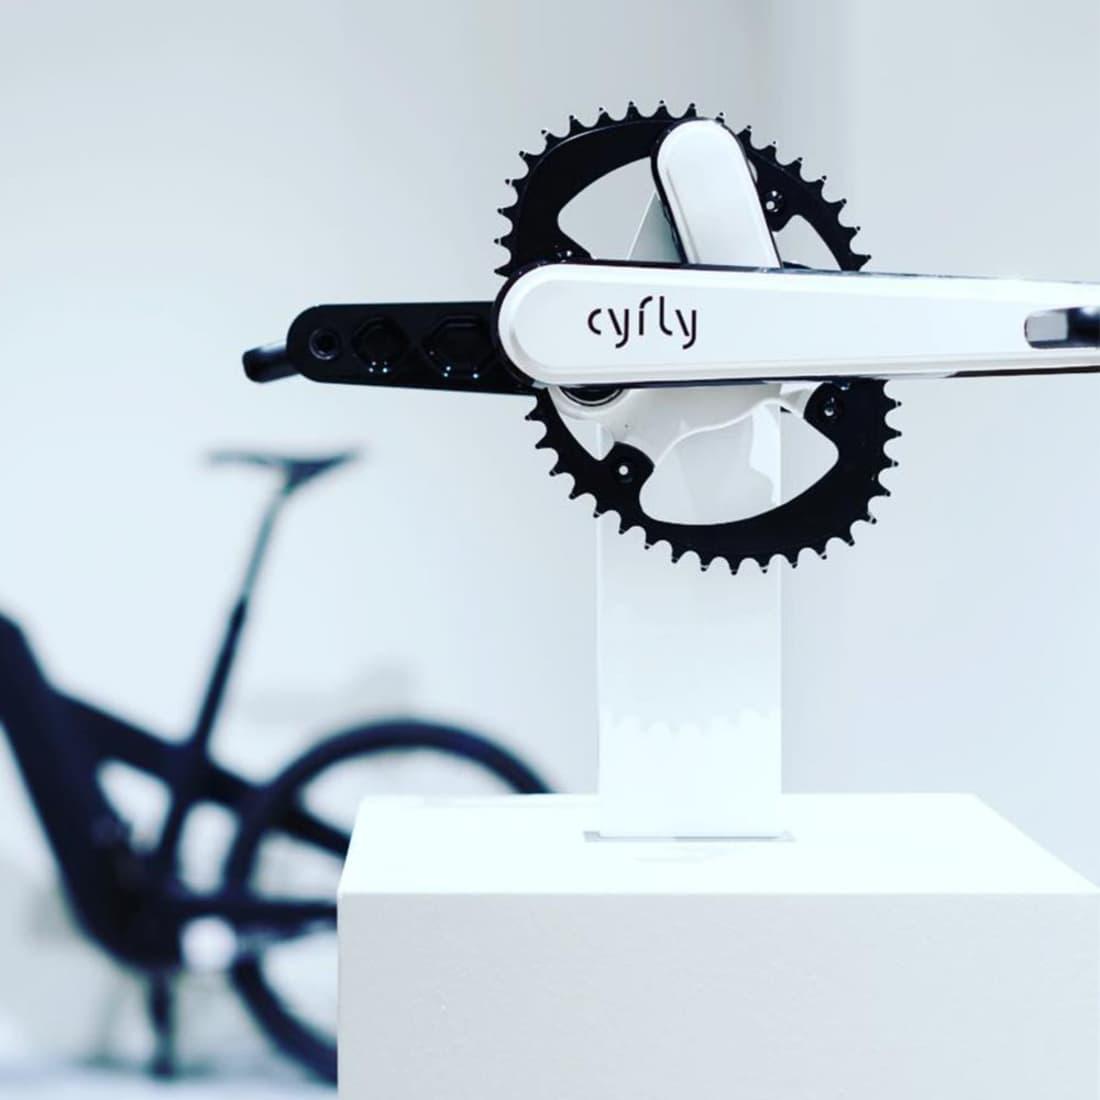 Cyfly Fahrrad-Antrieb verstärkt die Muskelkraft